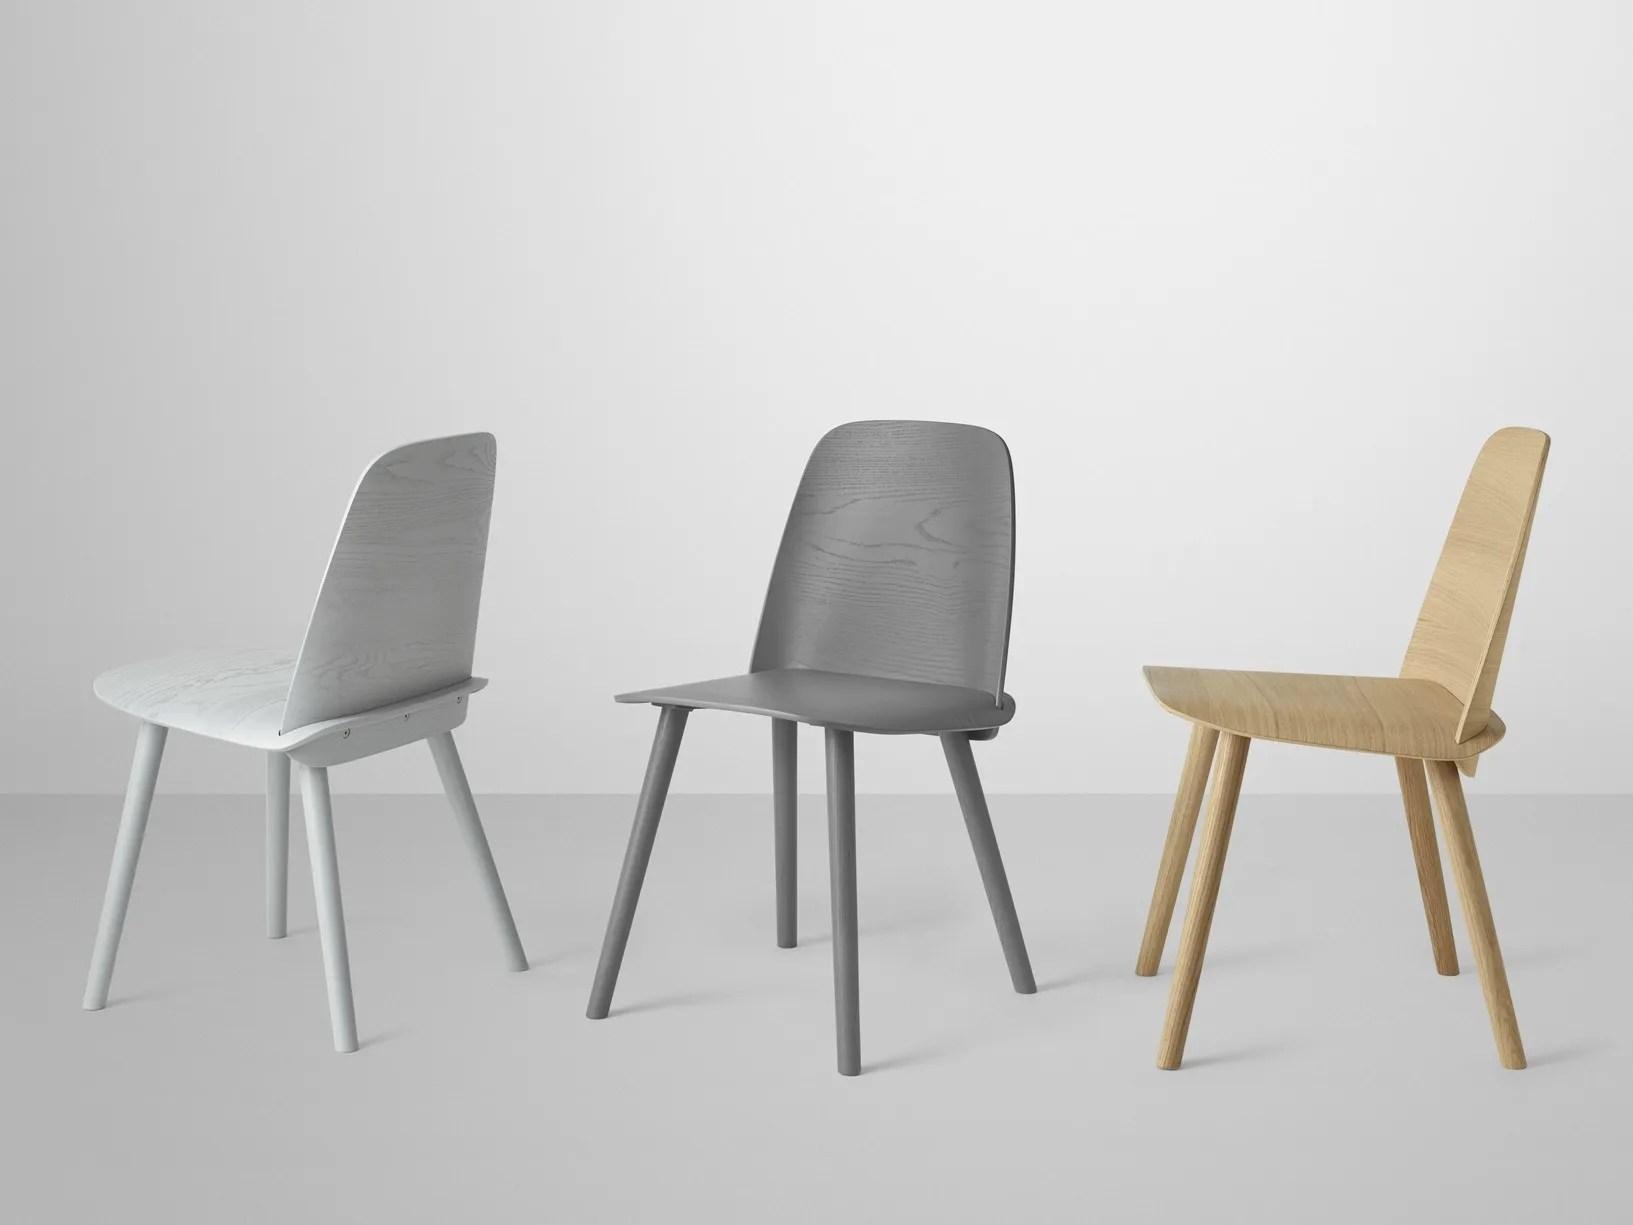 nerd chair muuto stokke tripp trapp high complete 4 piece bundle muutos iconic wooden wears in dark grey